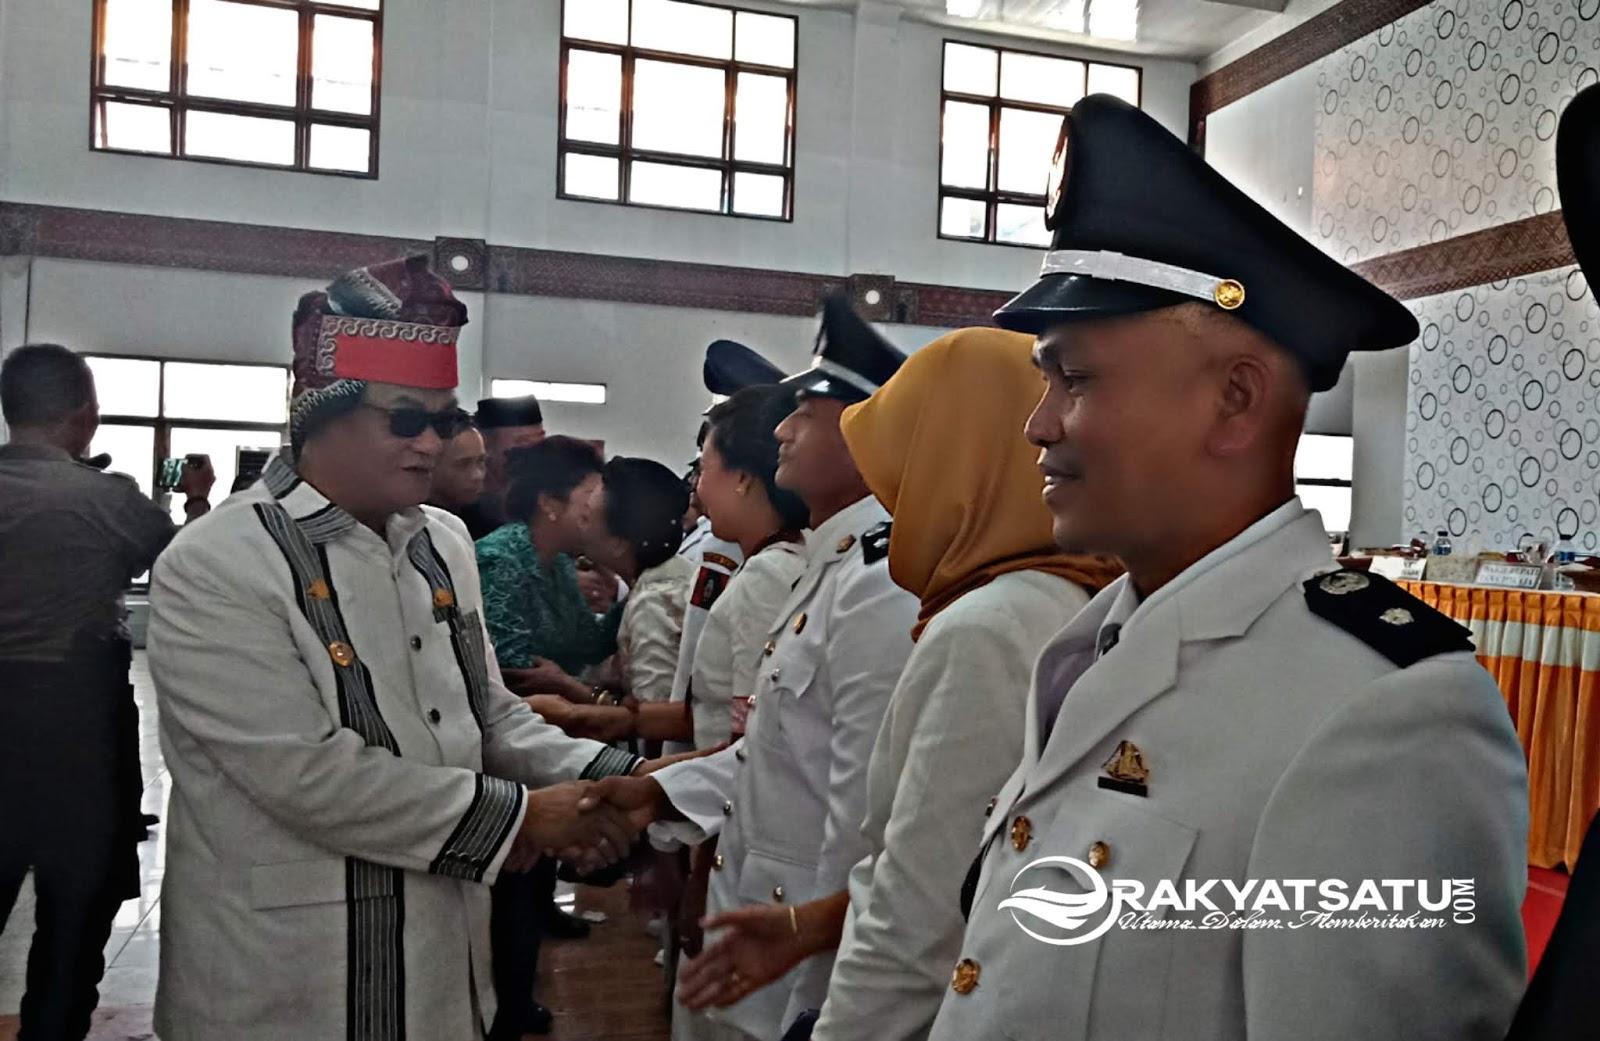 Delapan Kepala Lembang Tana Toraja Dilantik, Nico: Jangan Korupsi